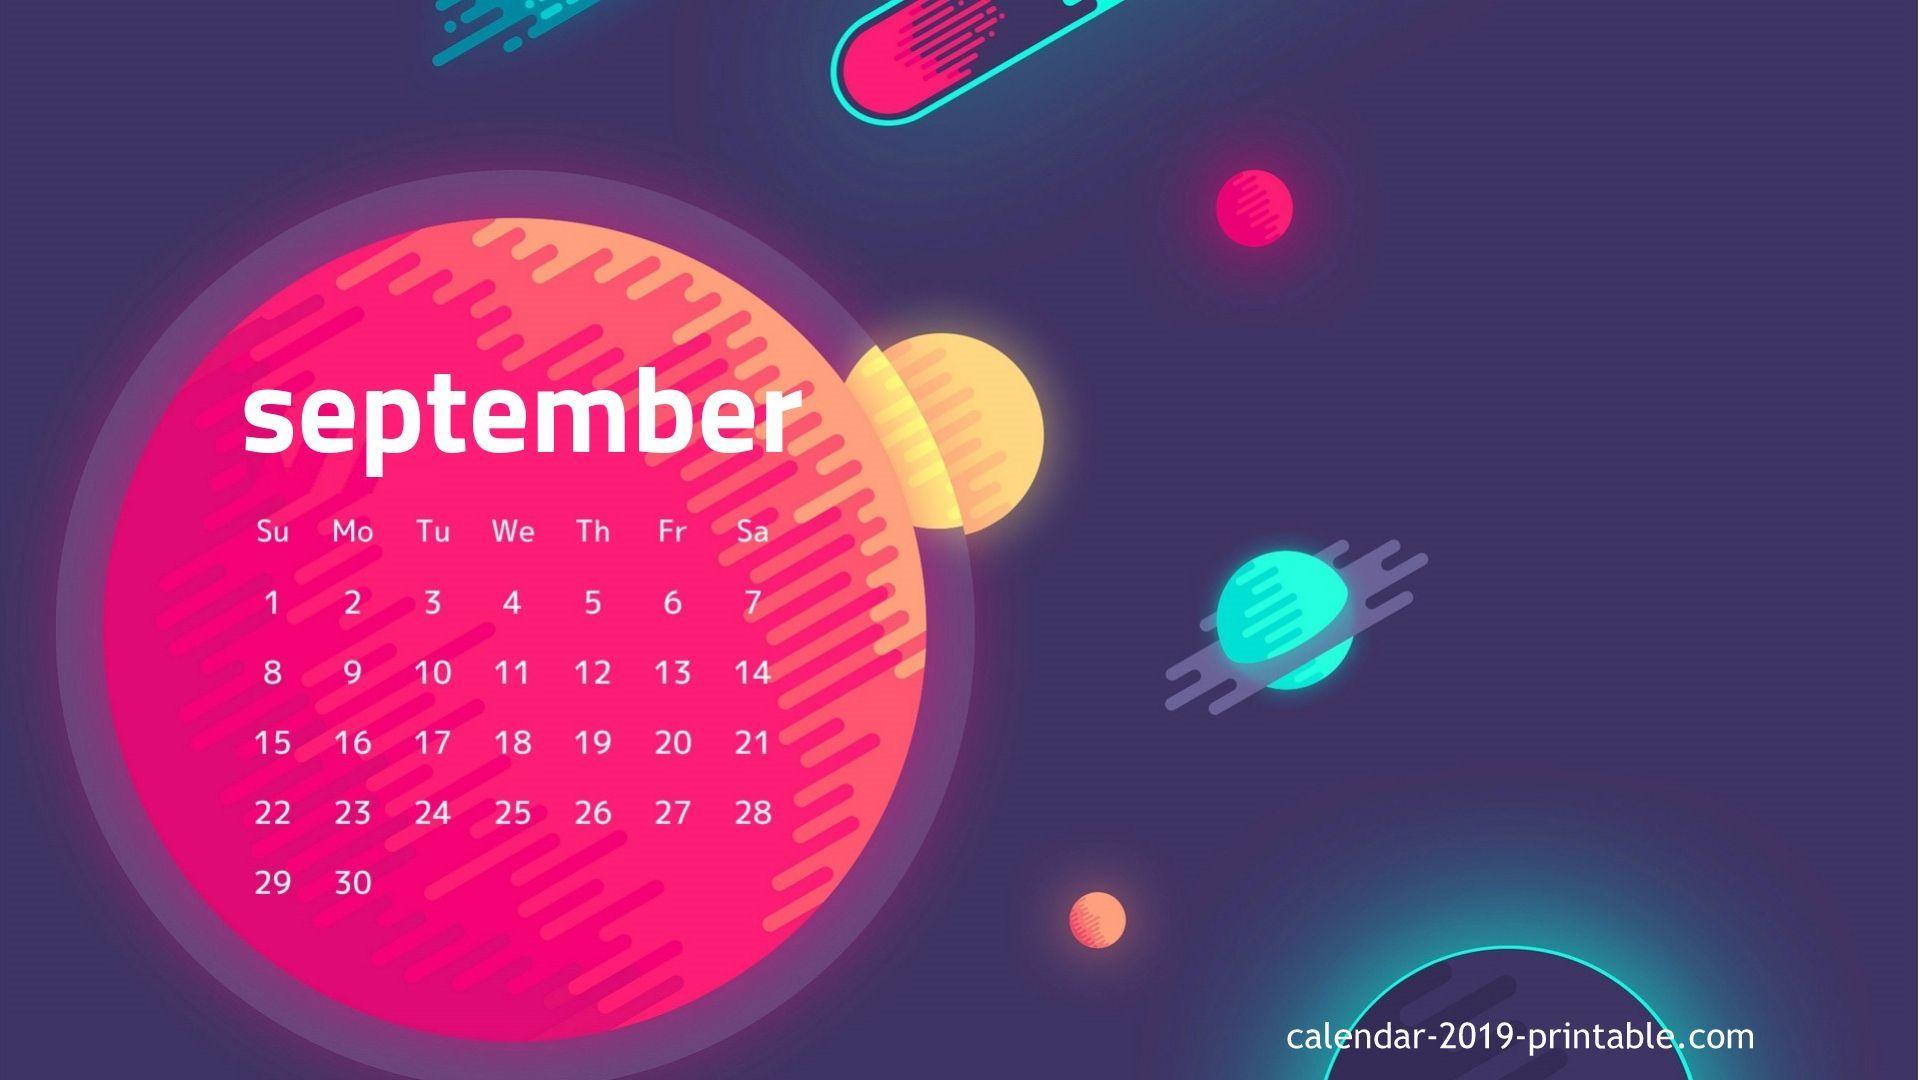 September 2019 Screensaver Calendar Wallpaper